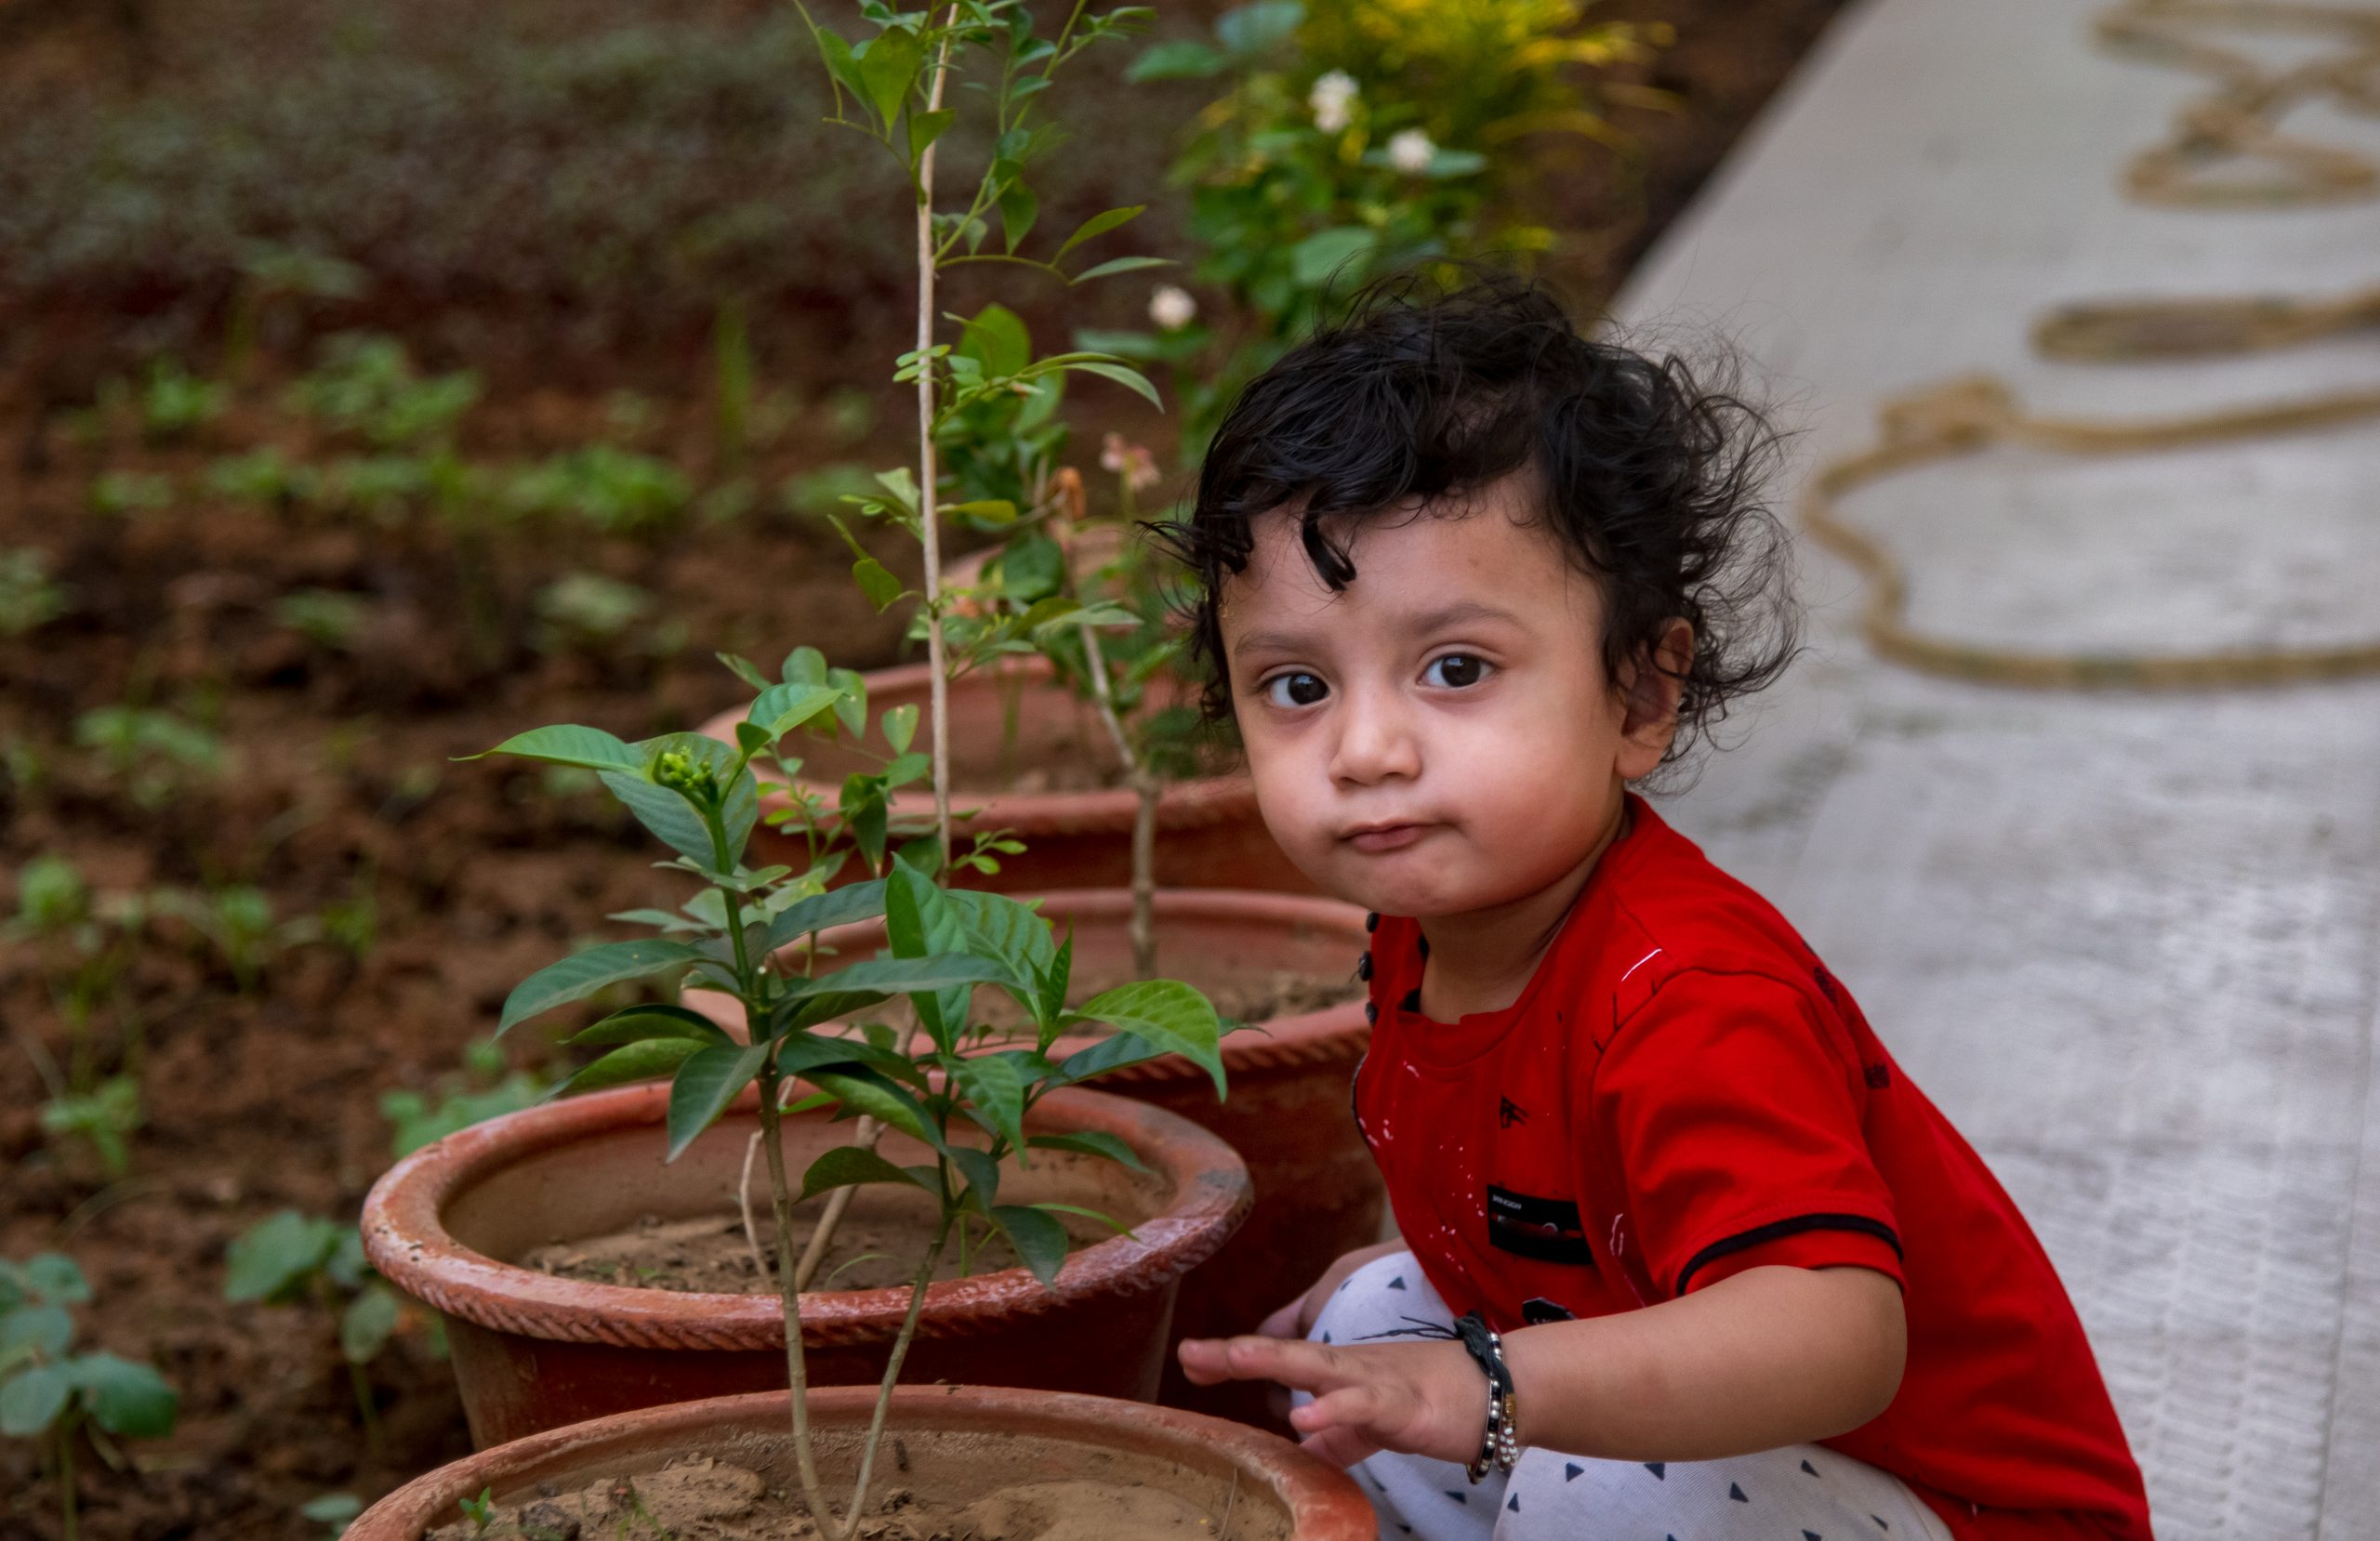 Little baby near the plant pot